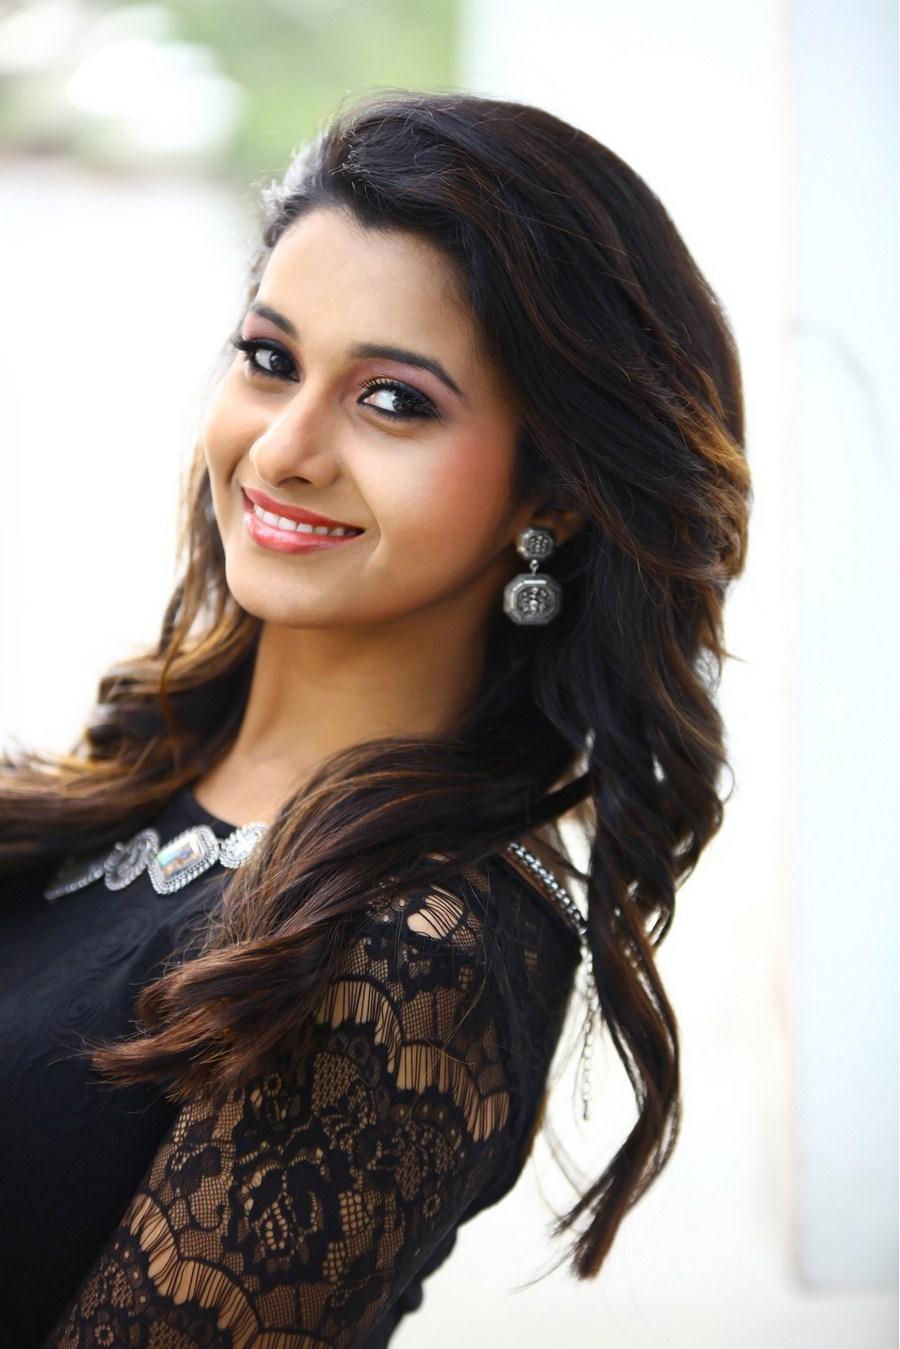 Actress Priya Bhavani Shankar Photo Gallery